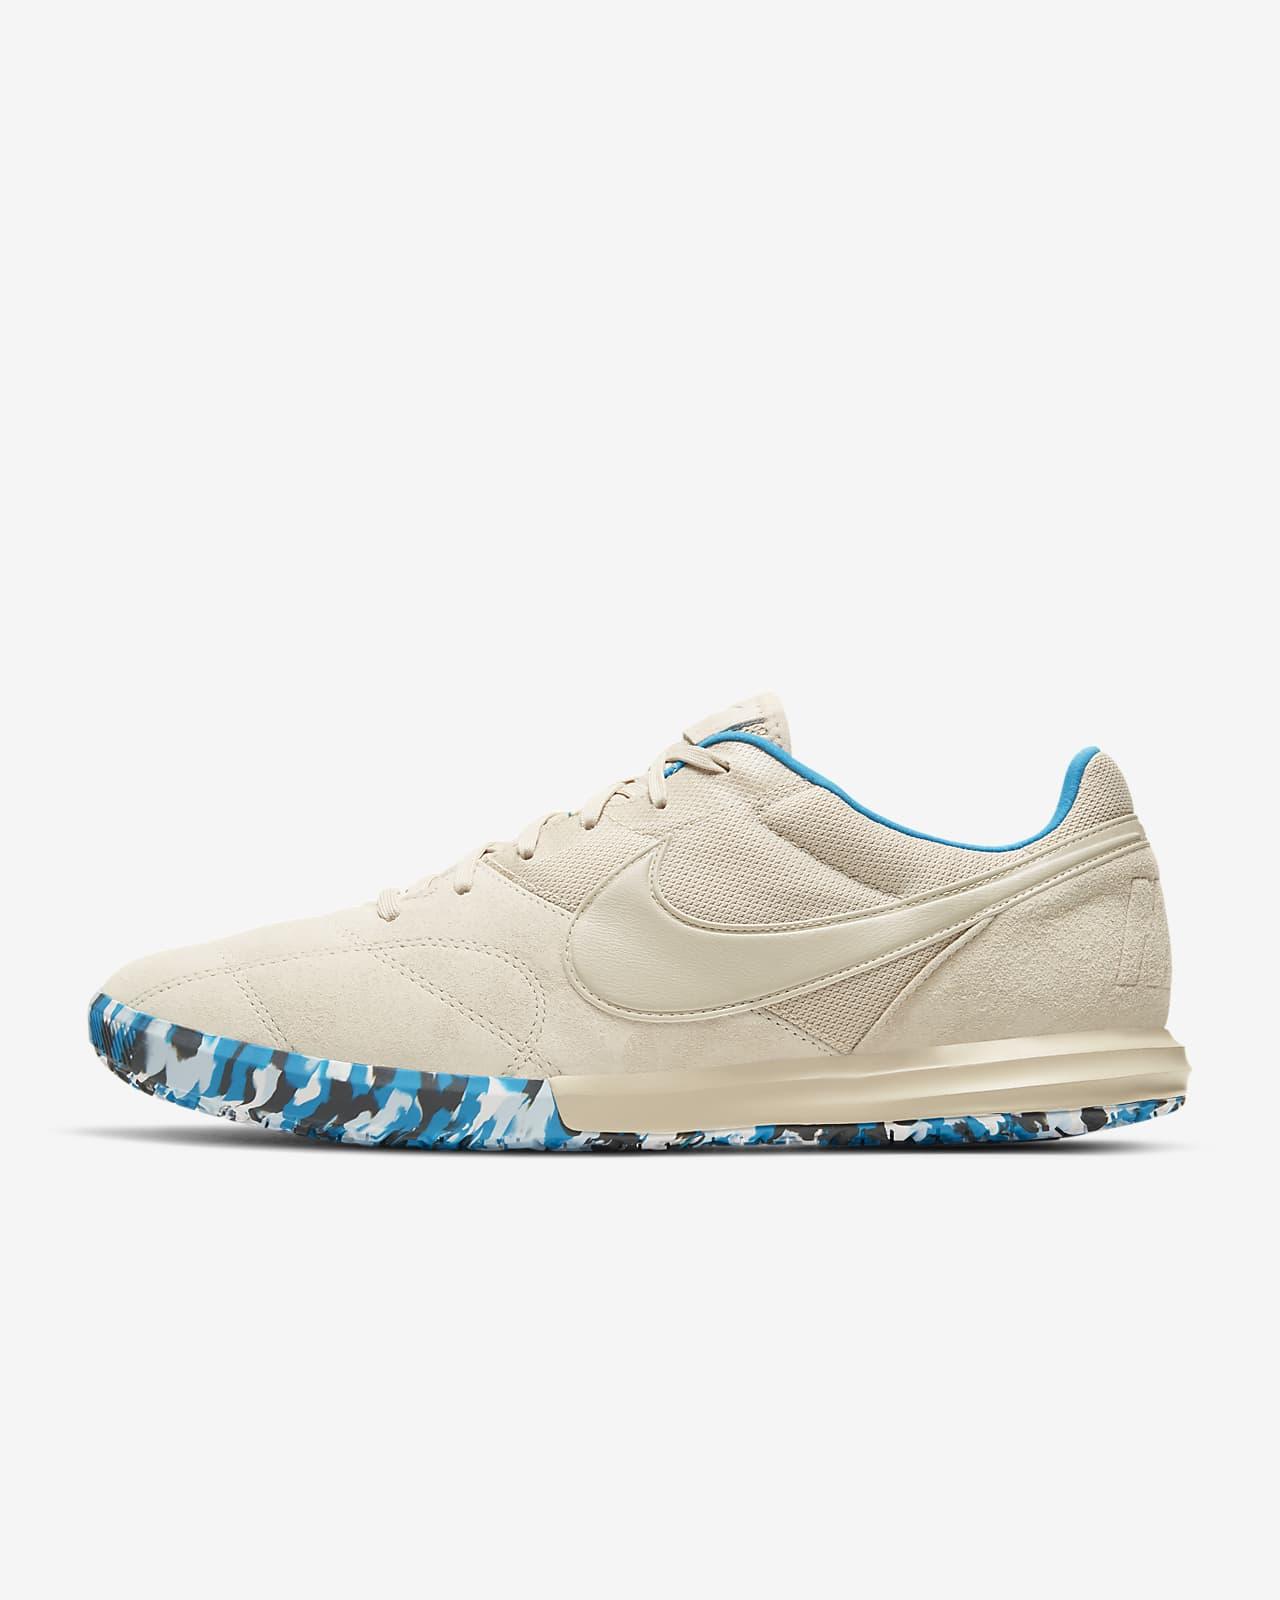 Sapatilhas de futsal Nike Premier 2 Sala IC